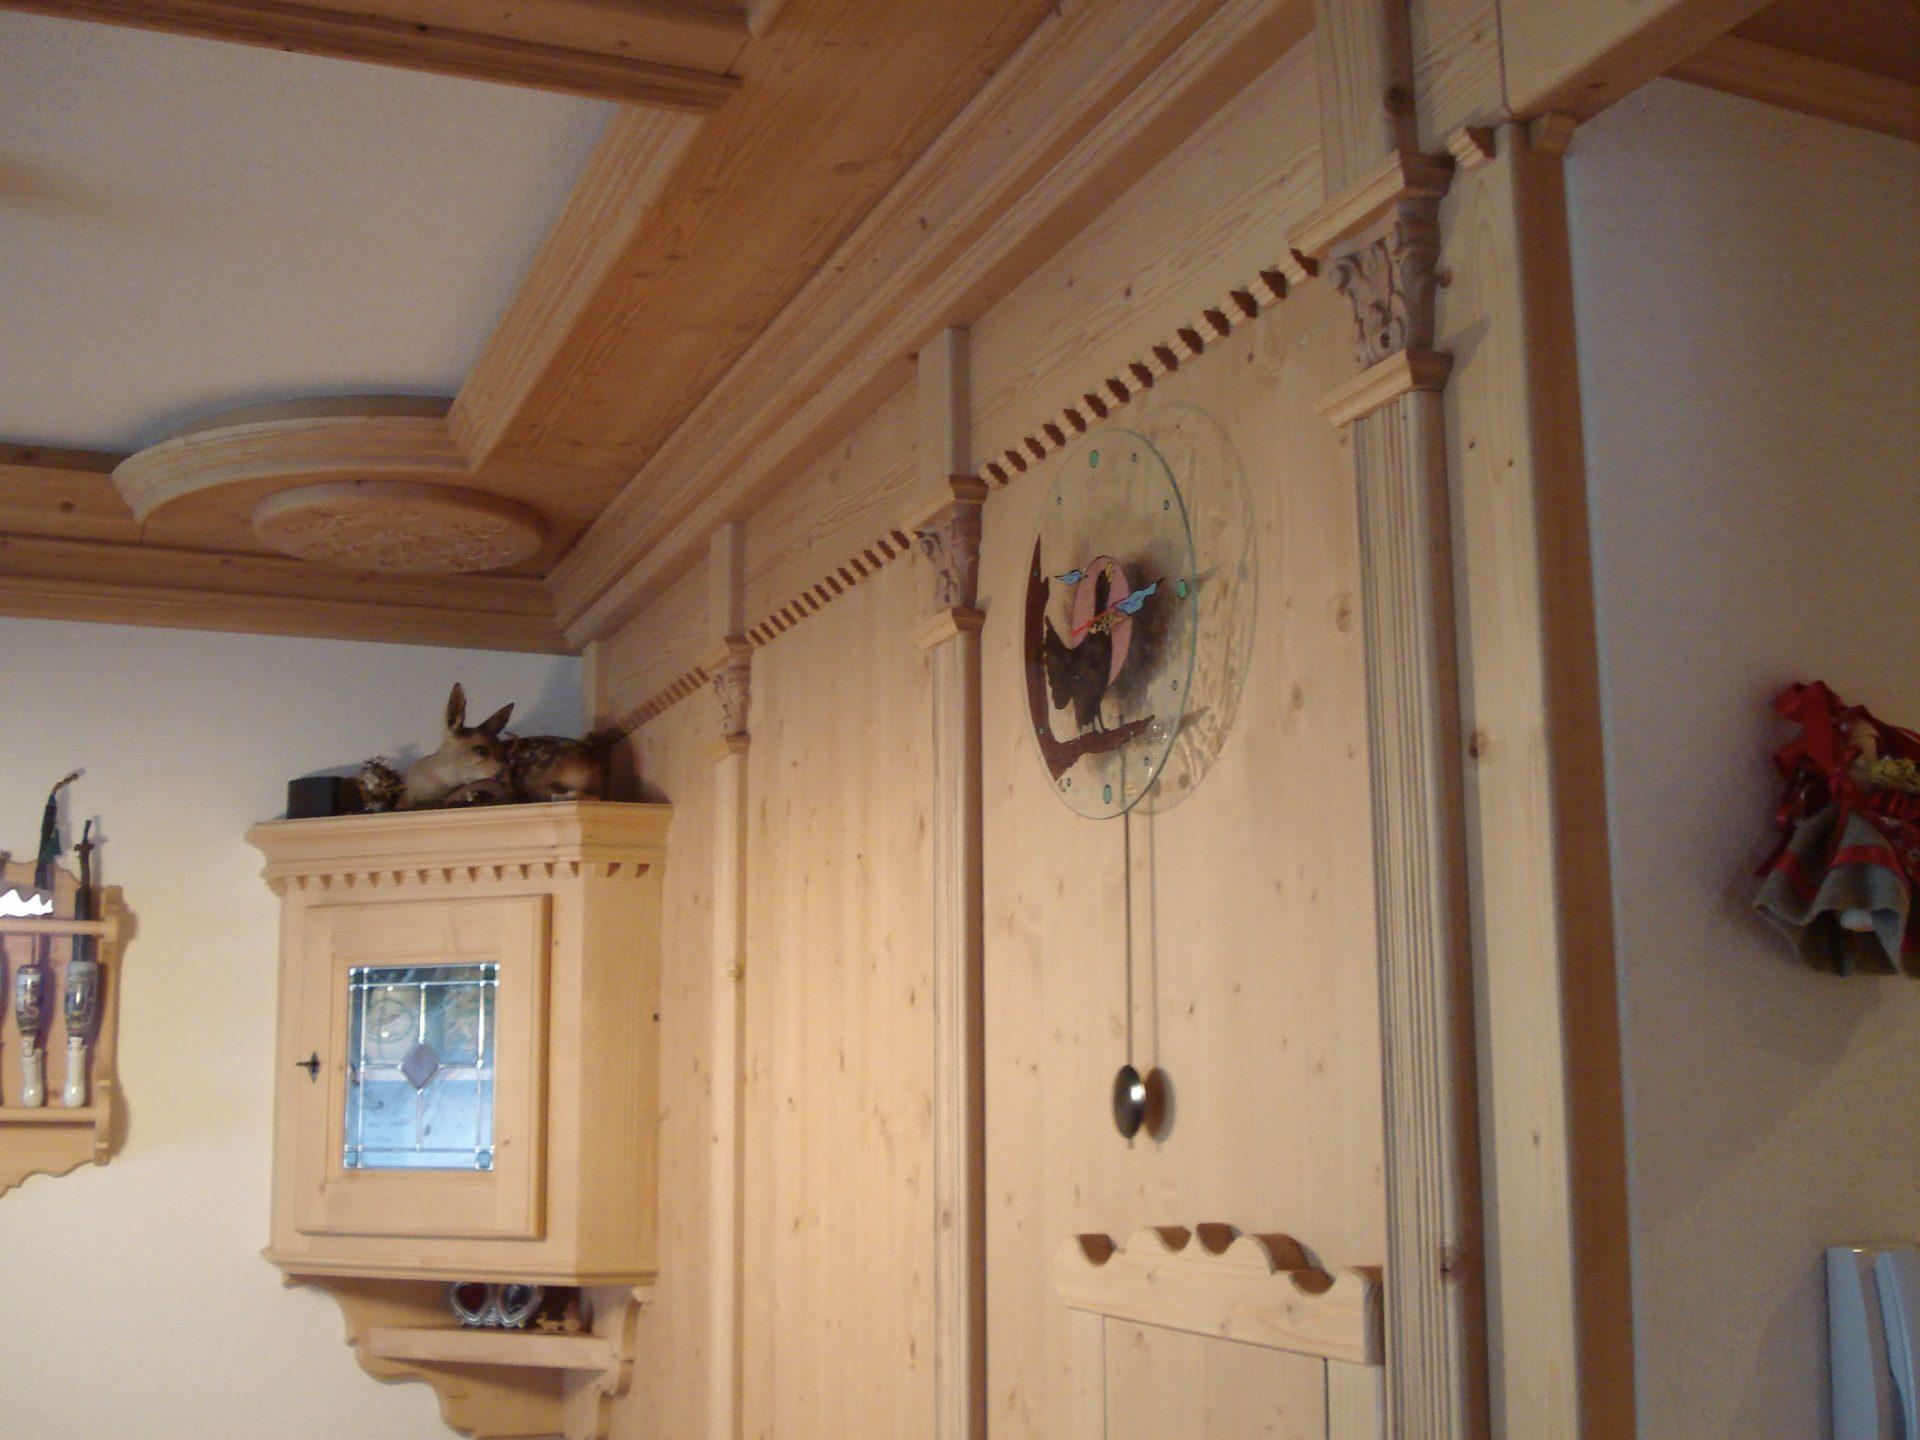 Best Soggiorni In Legno Gallery - Modern Home Design - orangetech.us